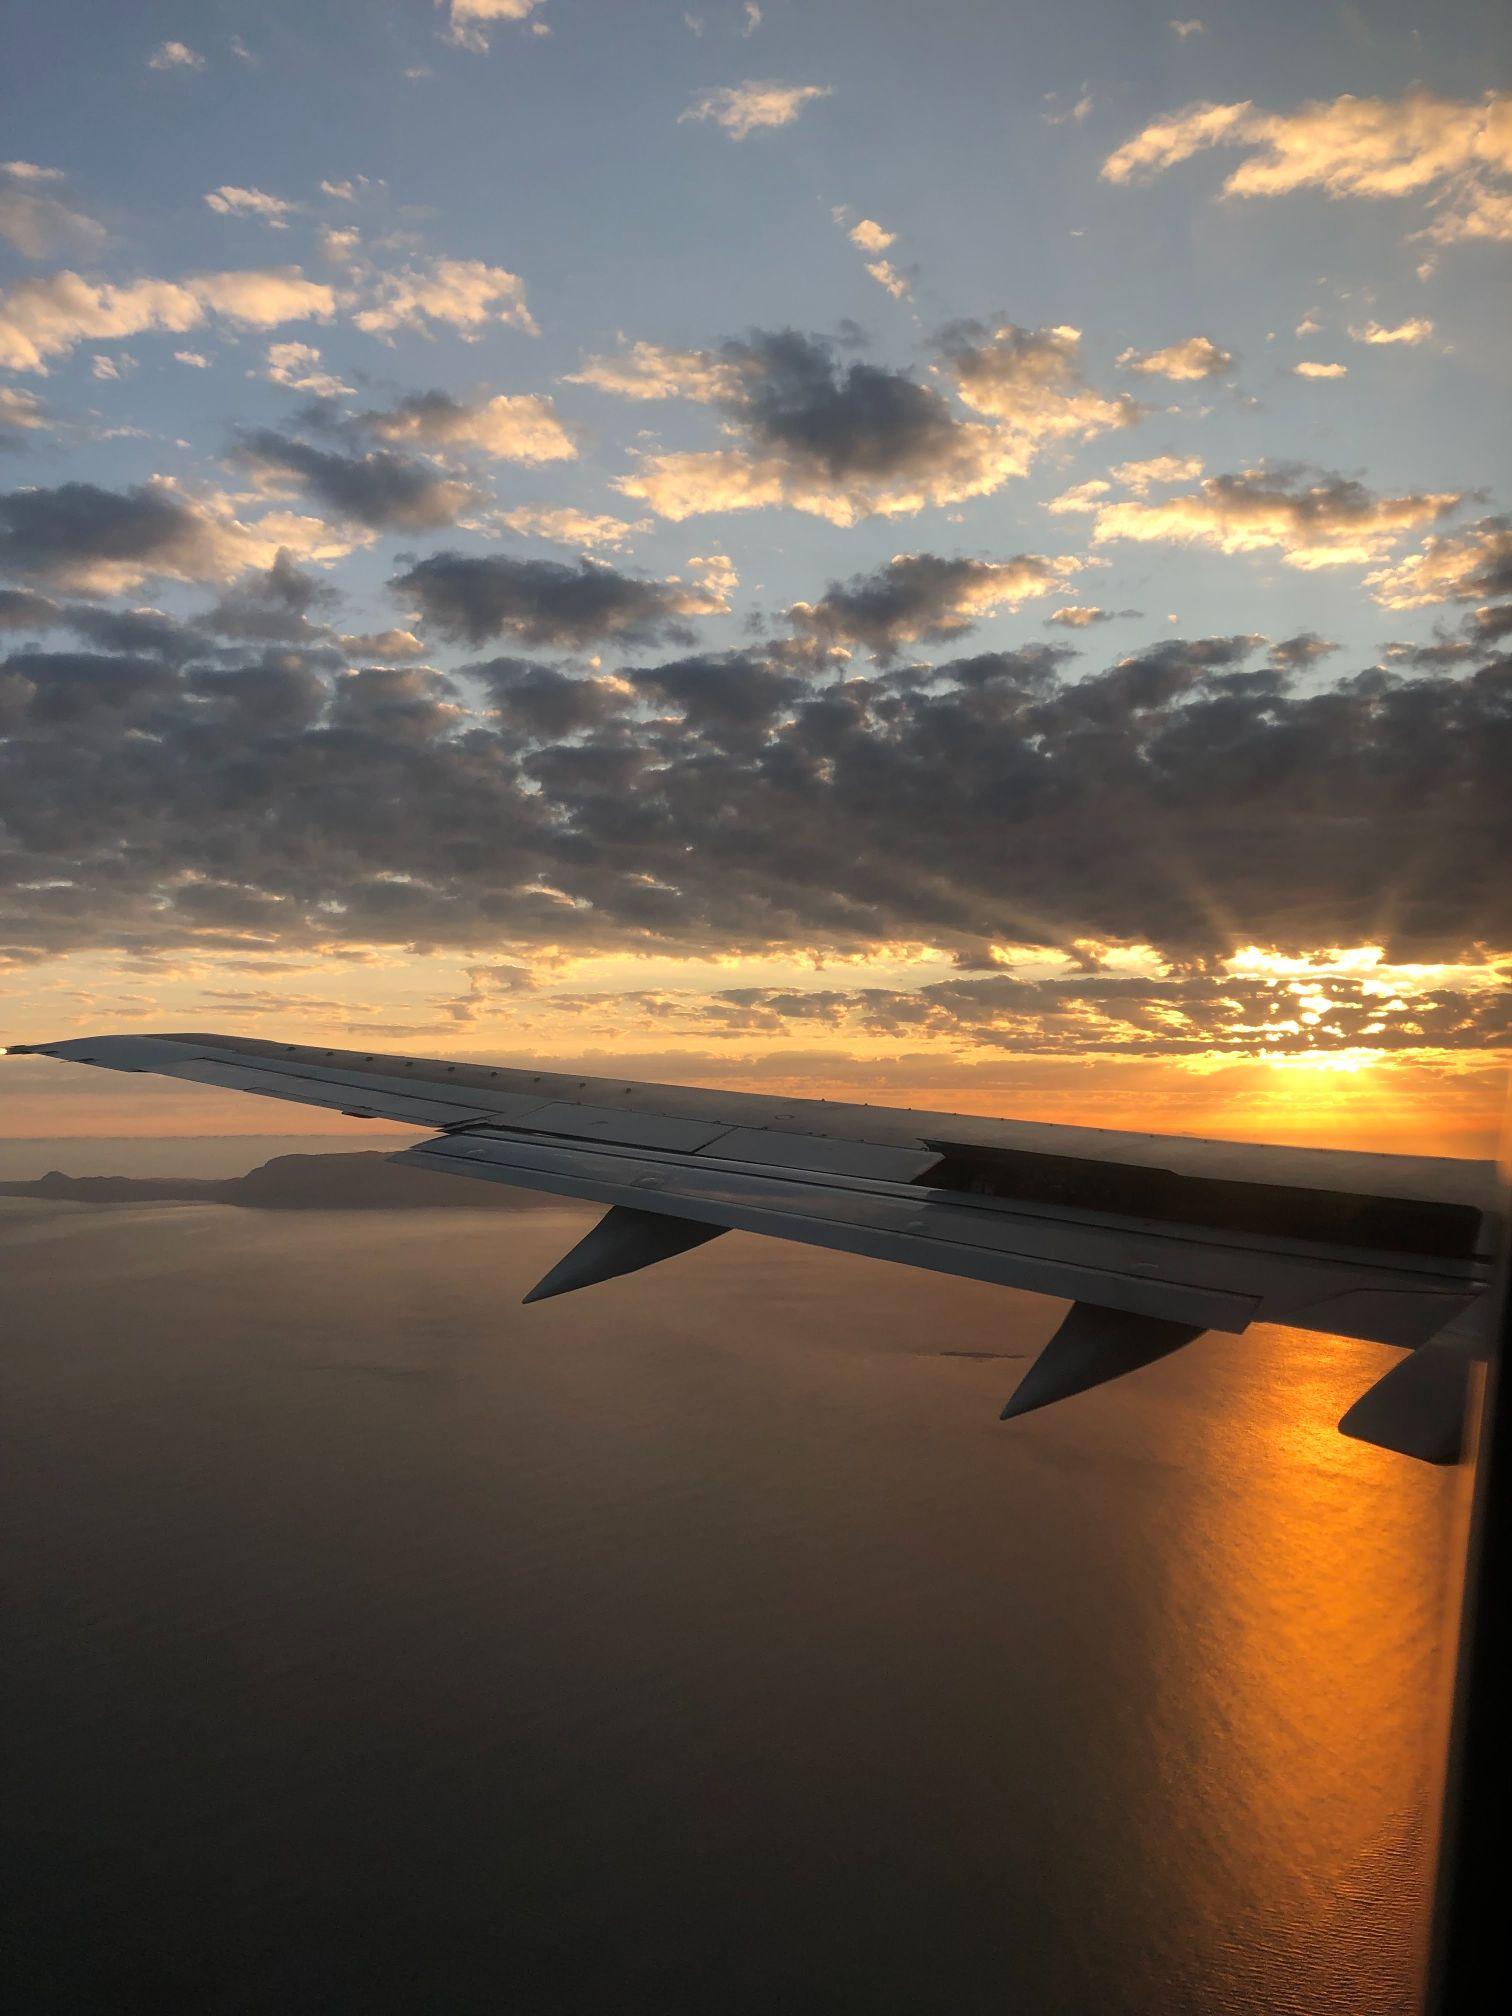 Flight from King Shaka airport Durban